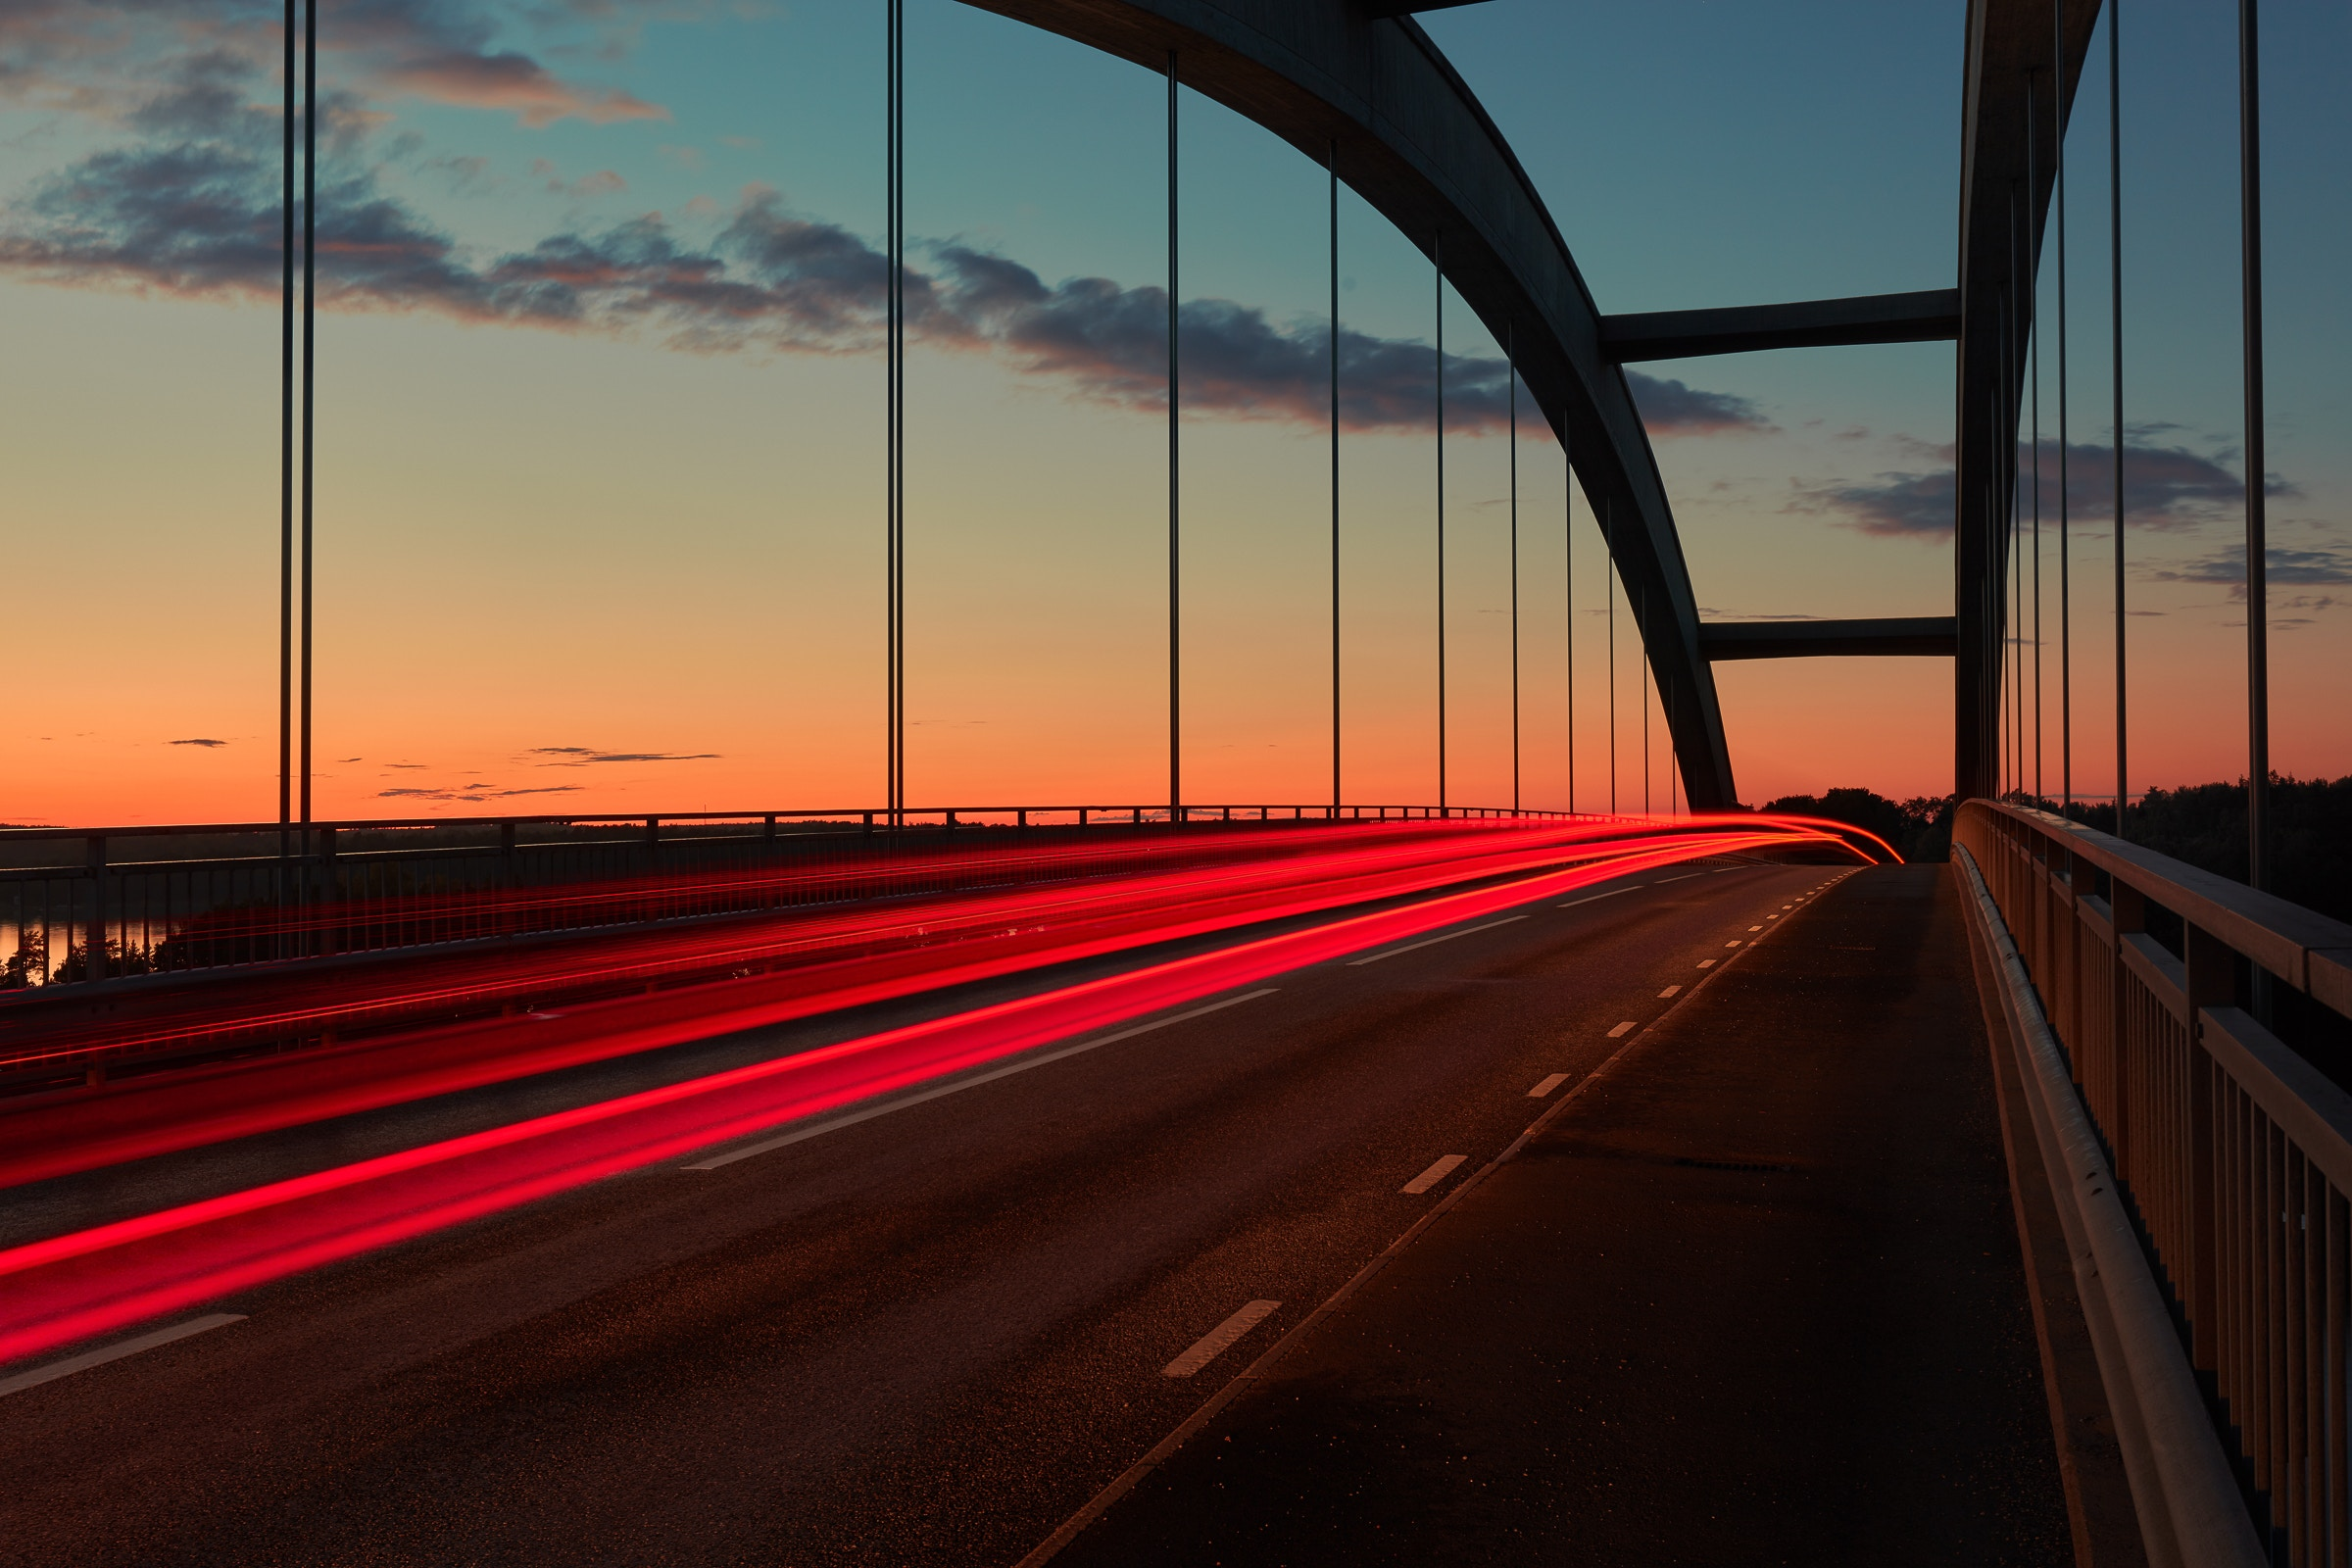 59839 скачать обои Мост, Закат, Небо, Разметка, Города - заставки и картинки бесплатно